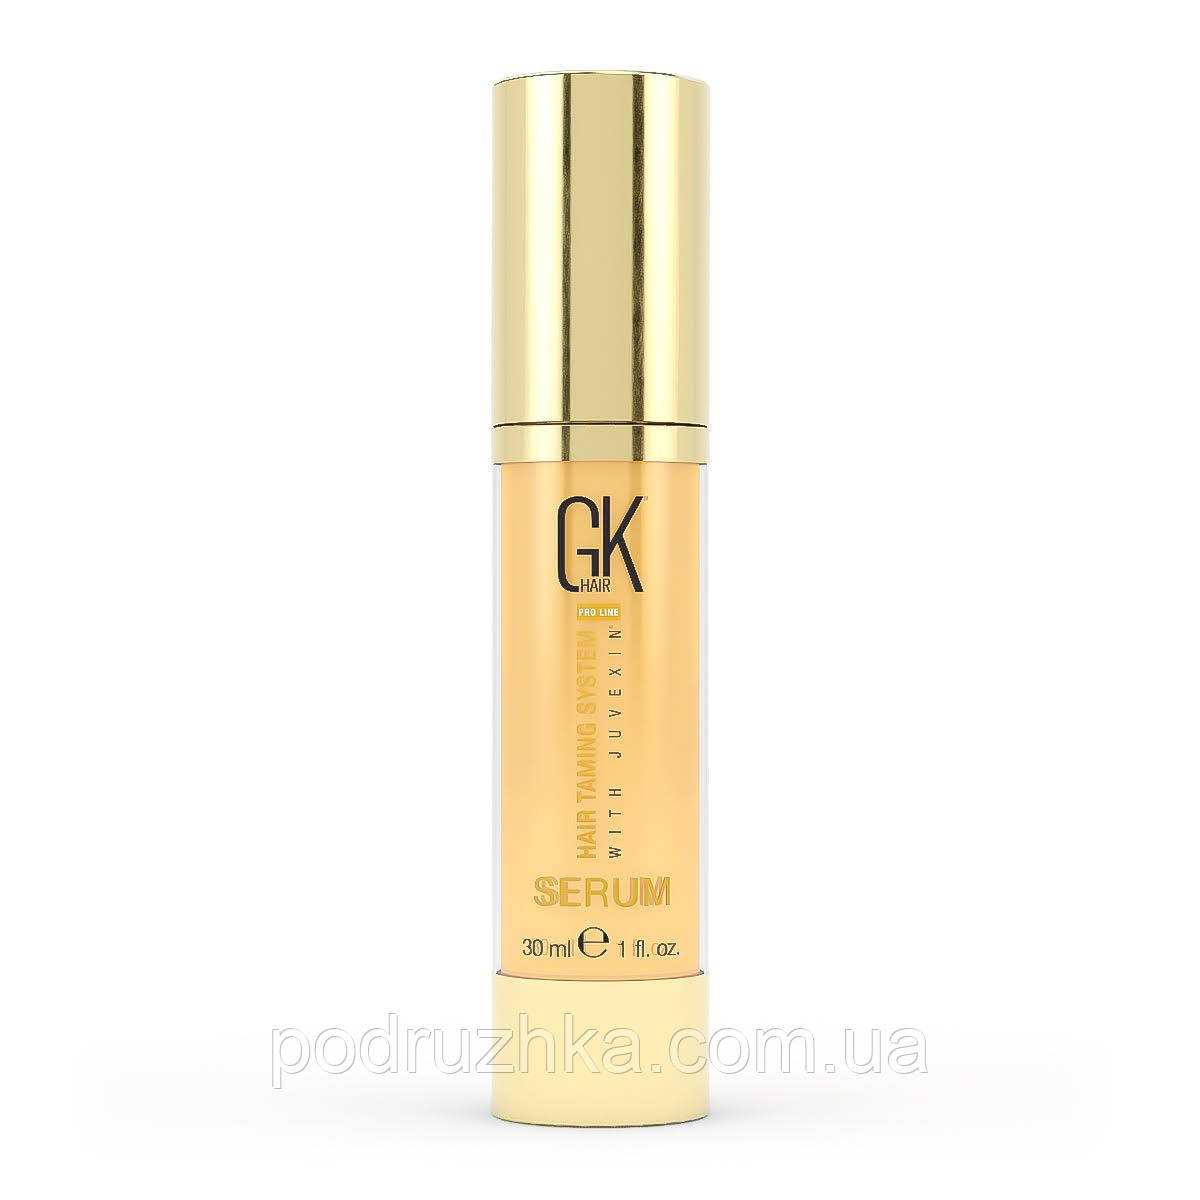 Сыворотка для волос GKhair Serum Gold, 30 мл